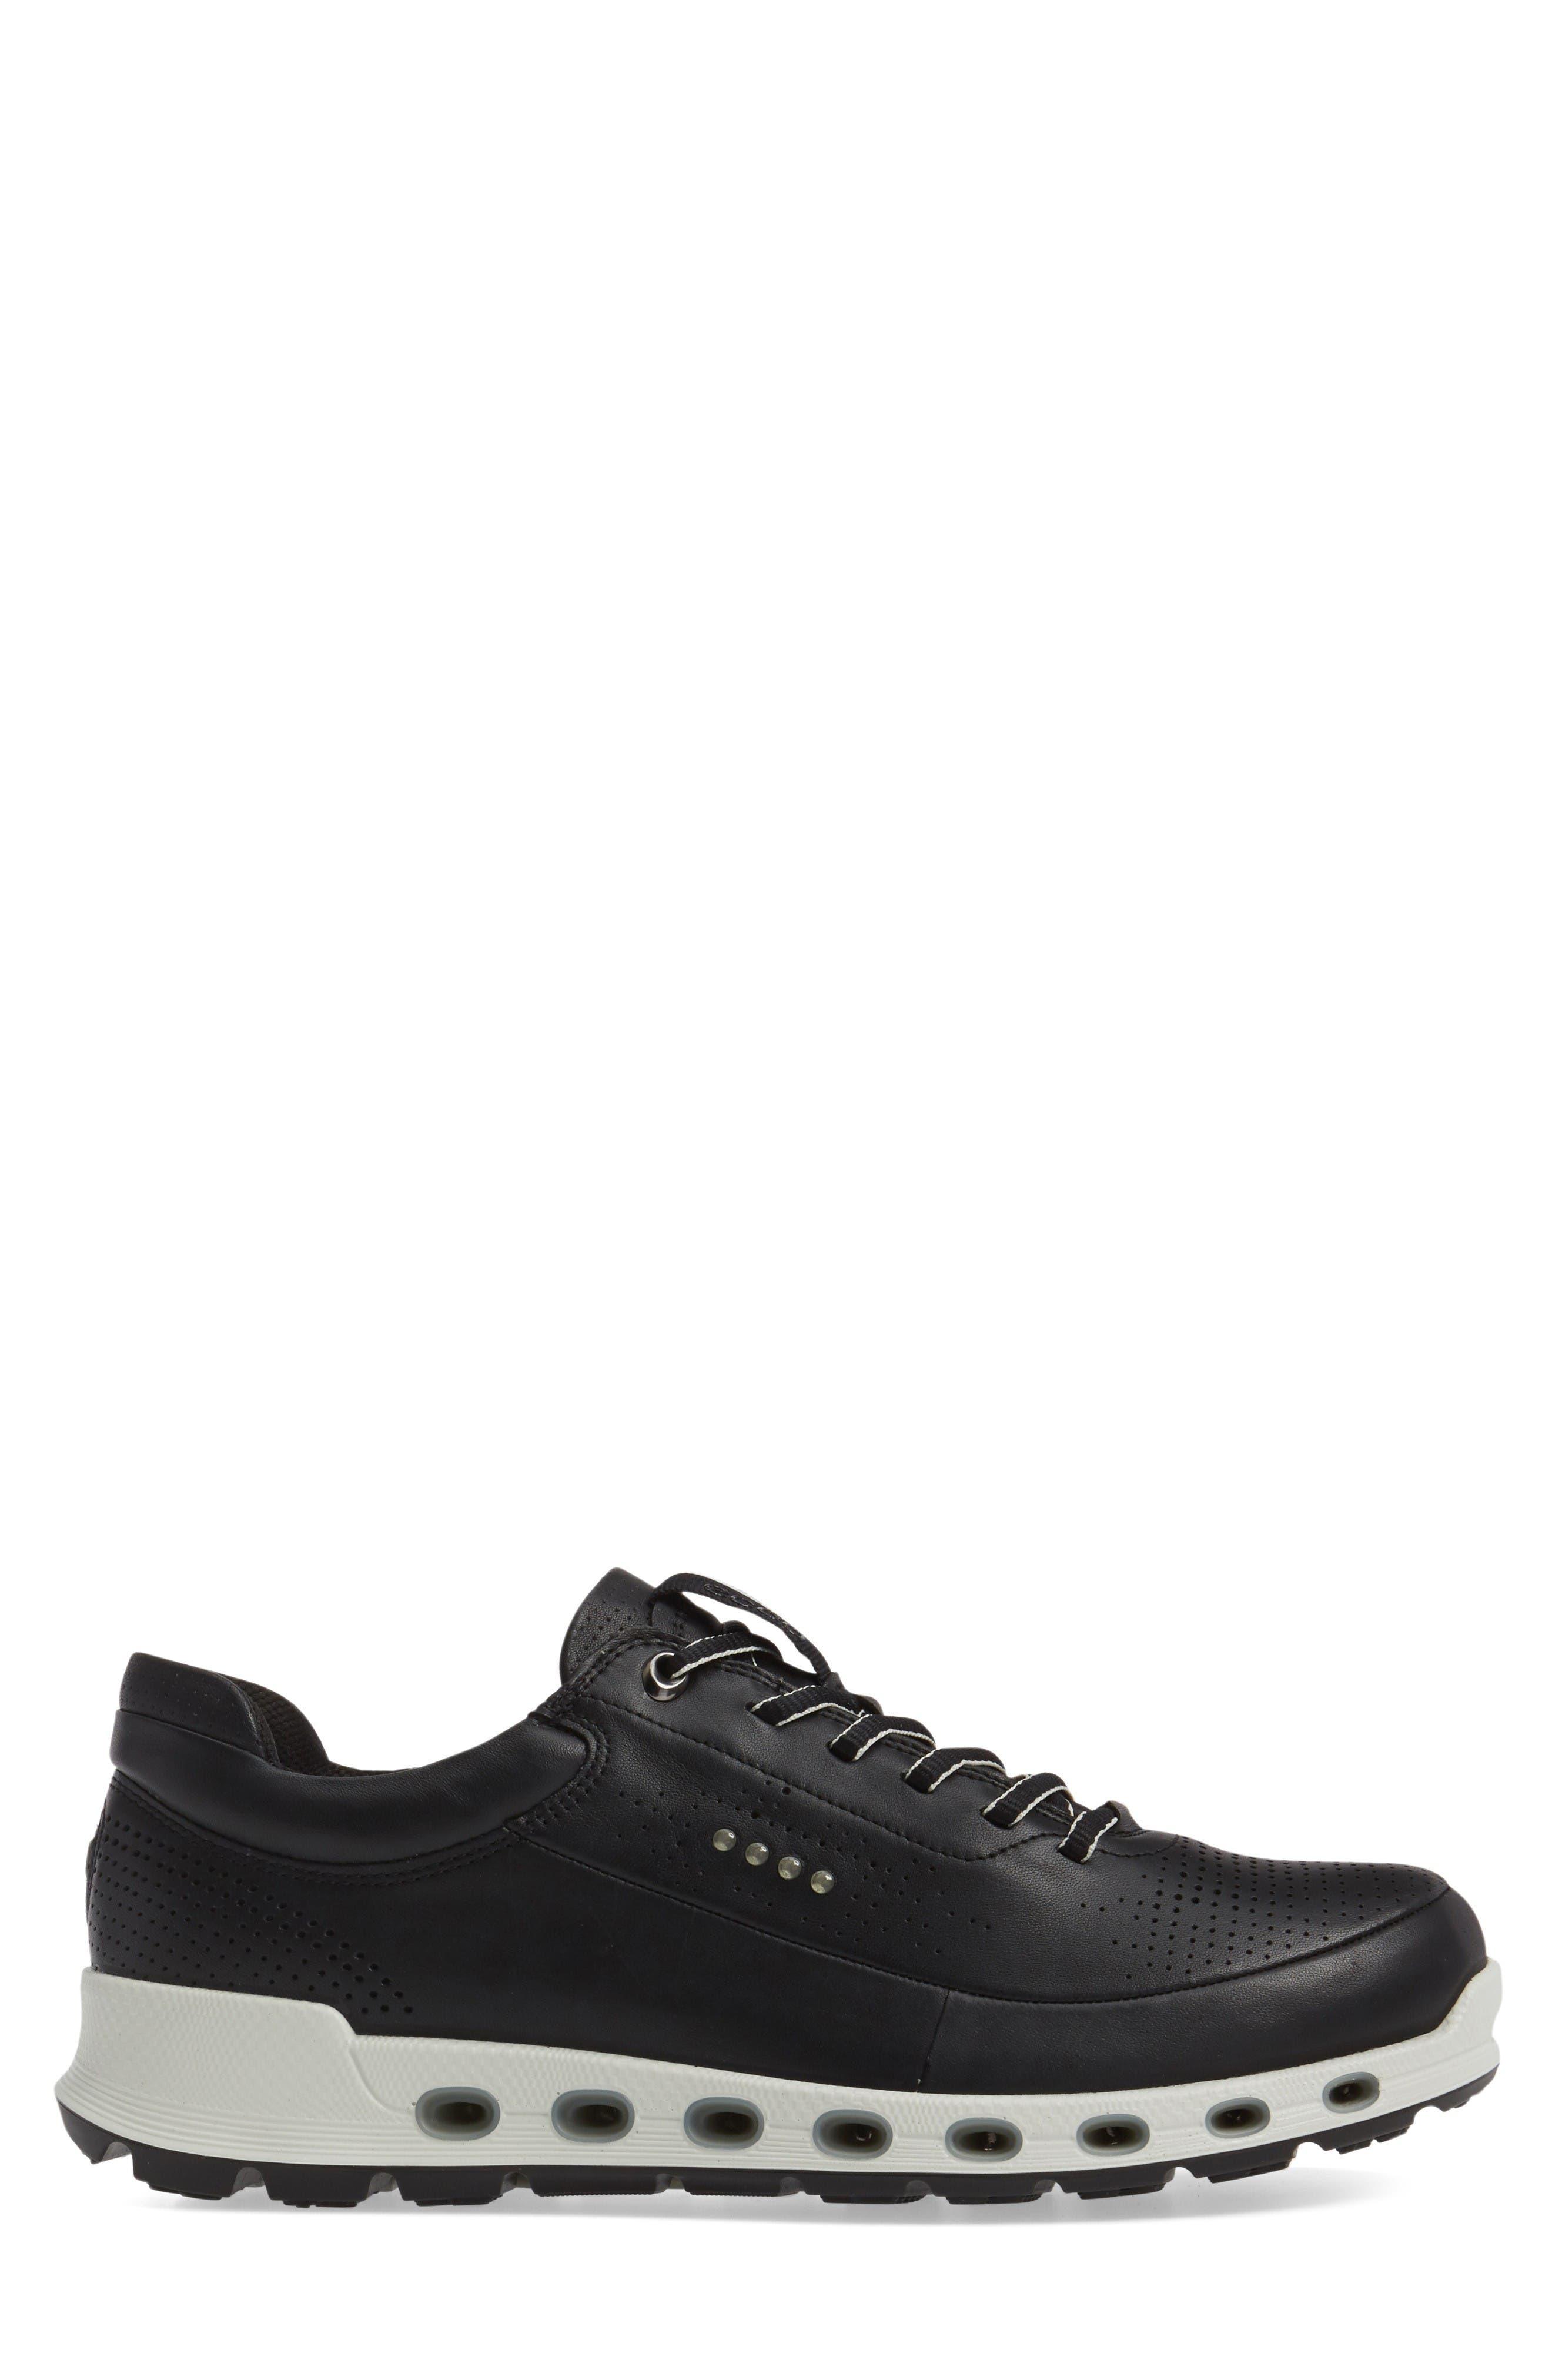 Alternate Image 3  - ECCO Cool 2.0 Leather GTX Sneaker